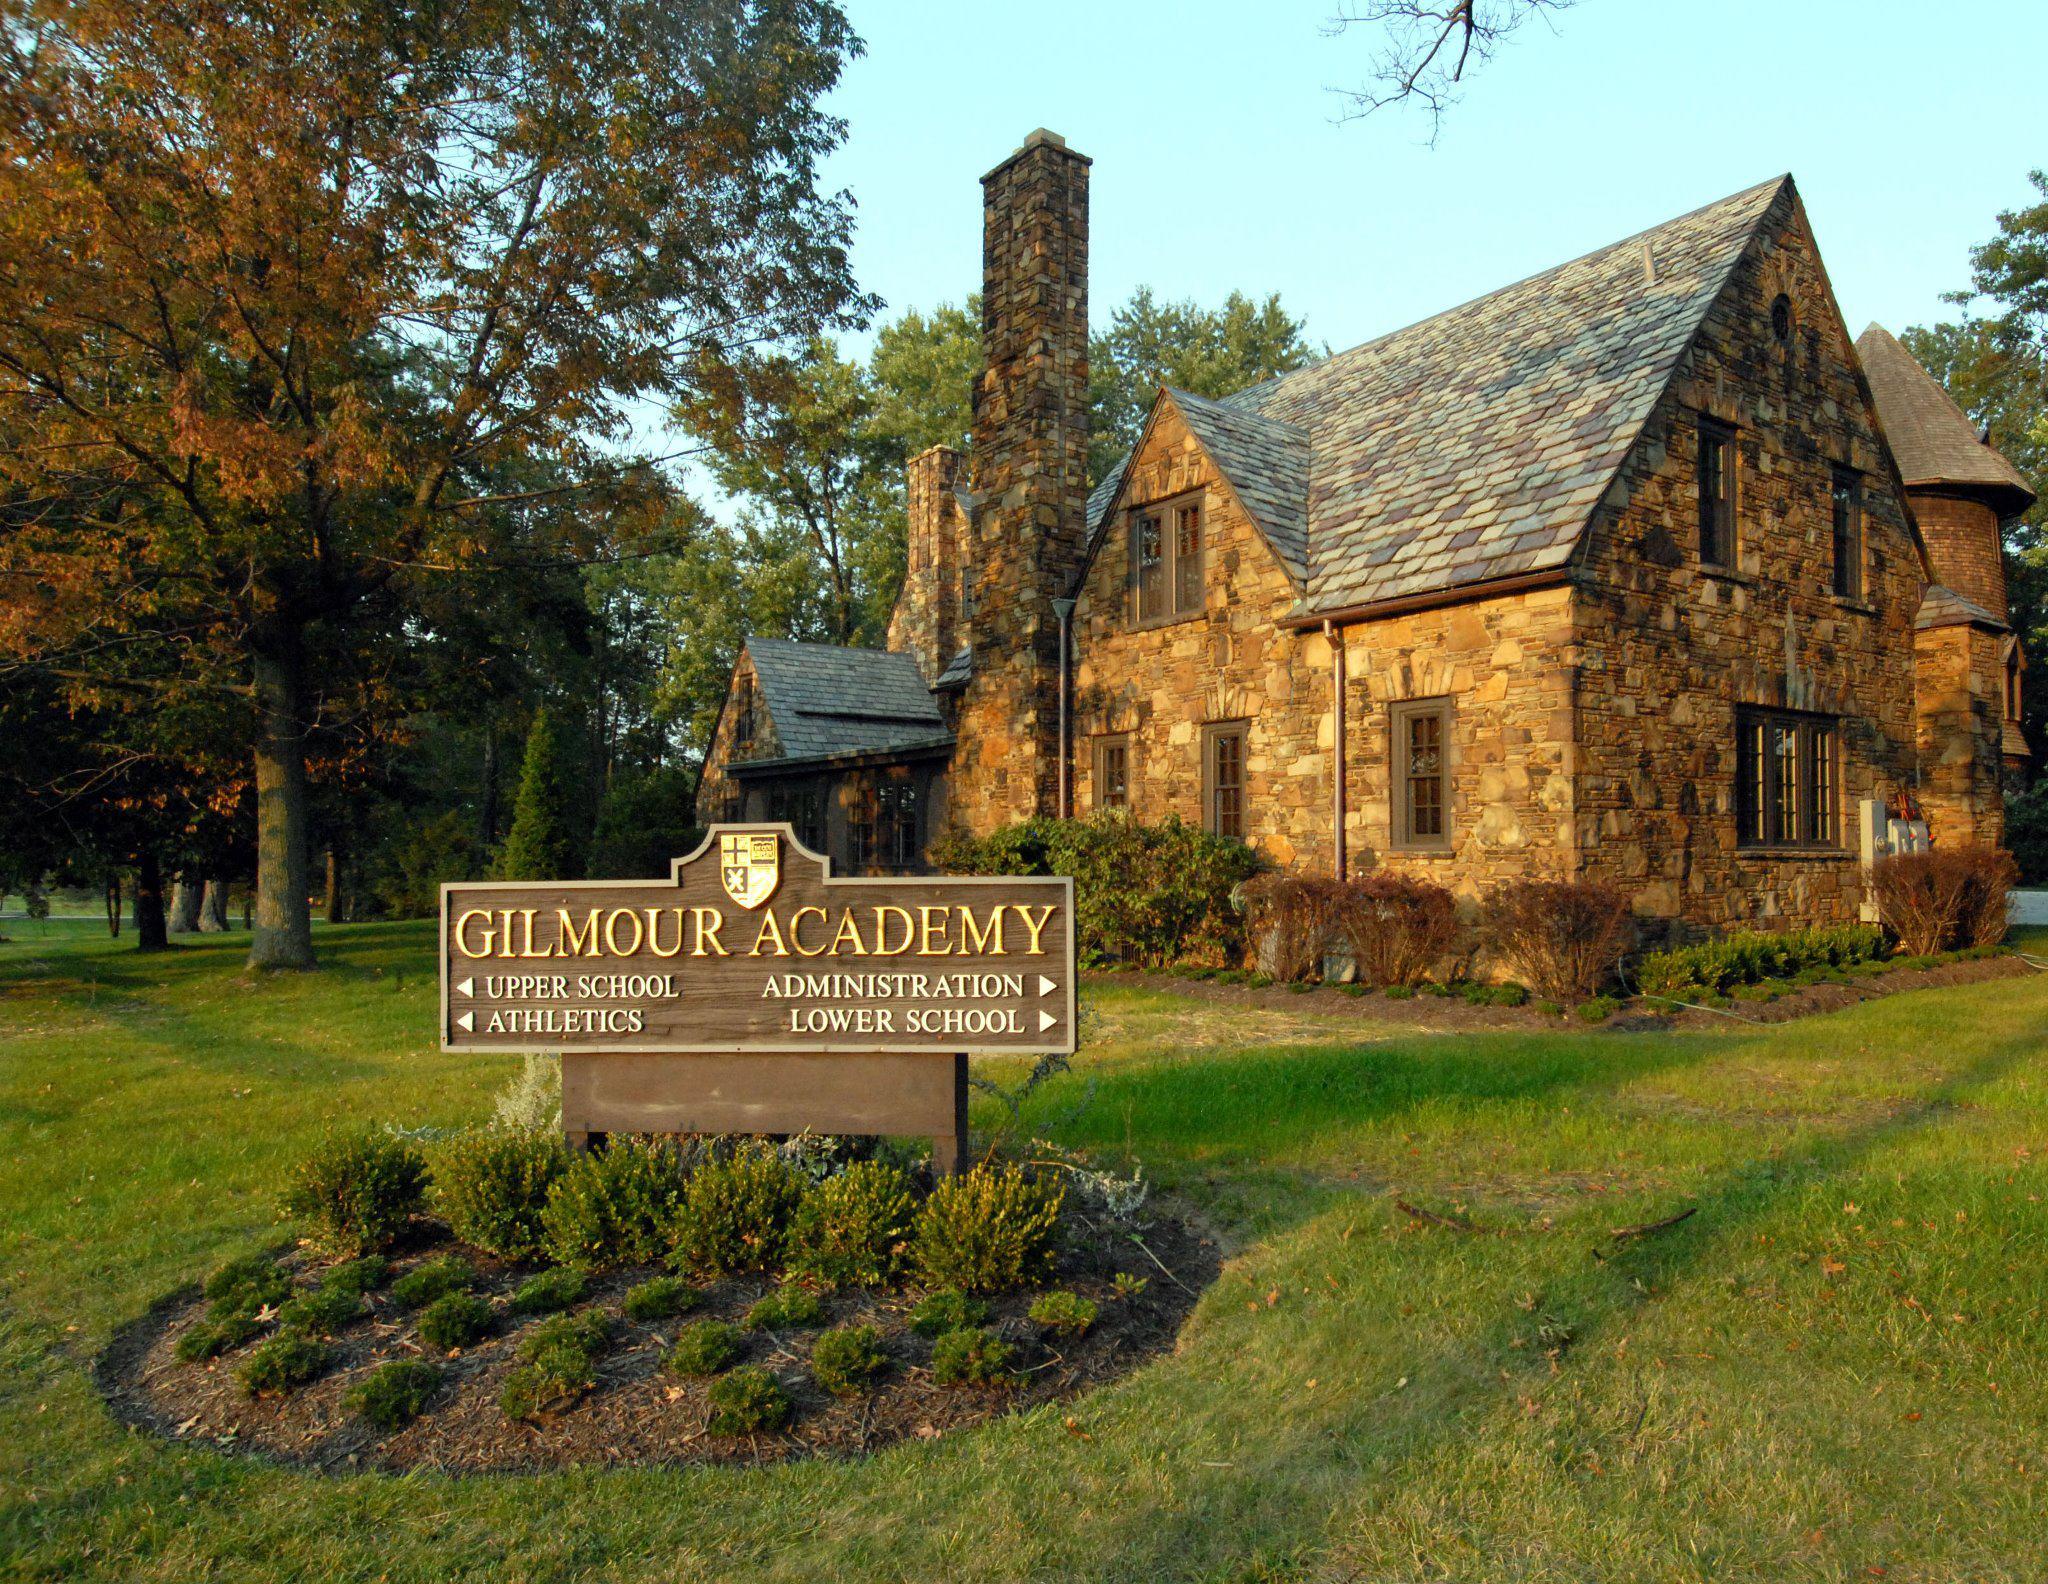 Gilmour Academy in Gates Mills, Ohio